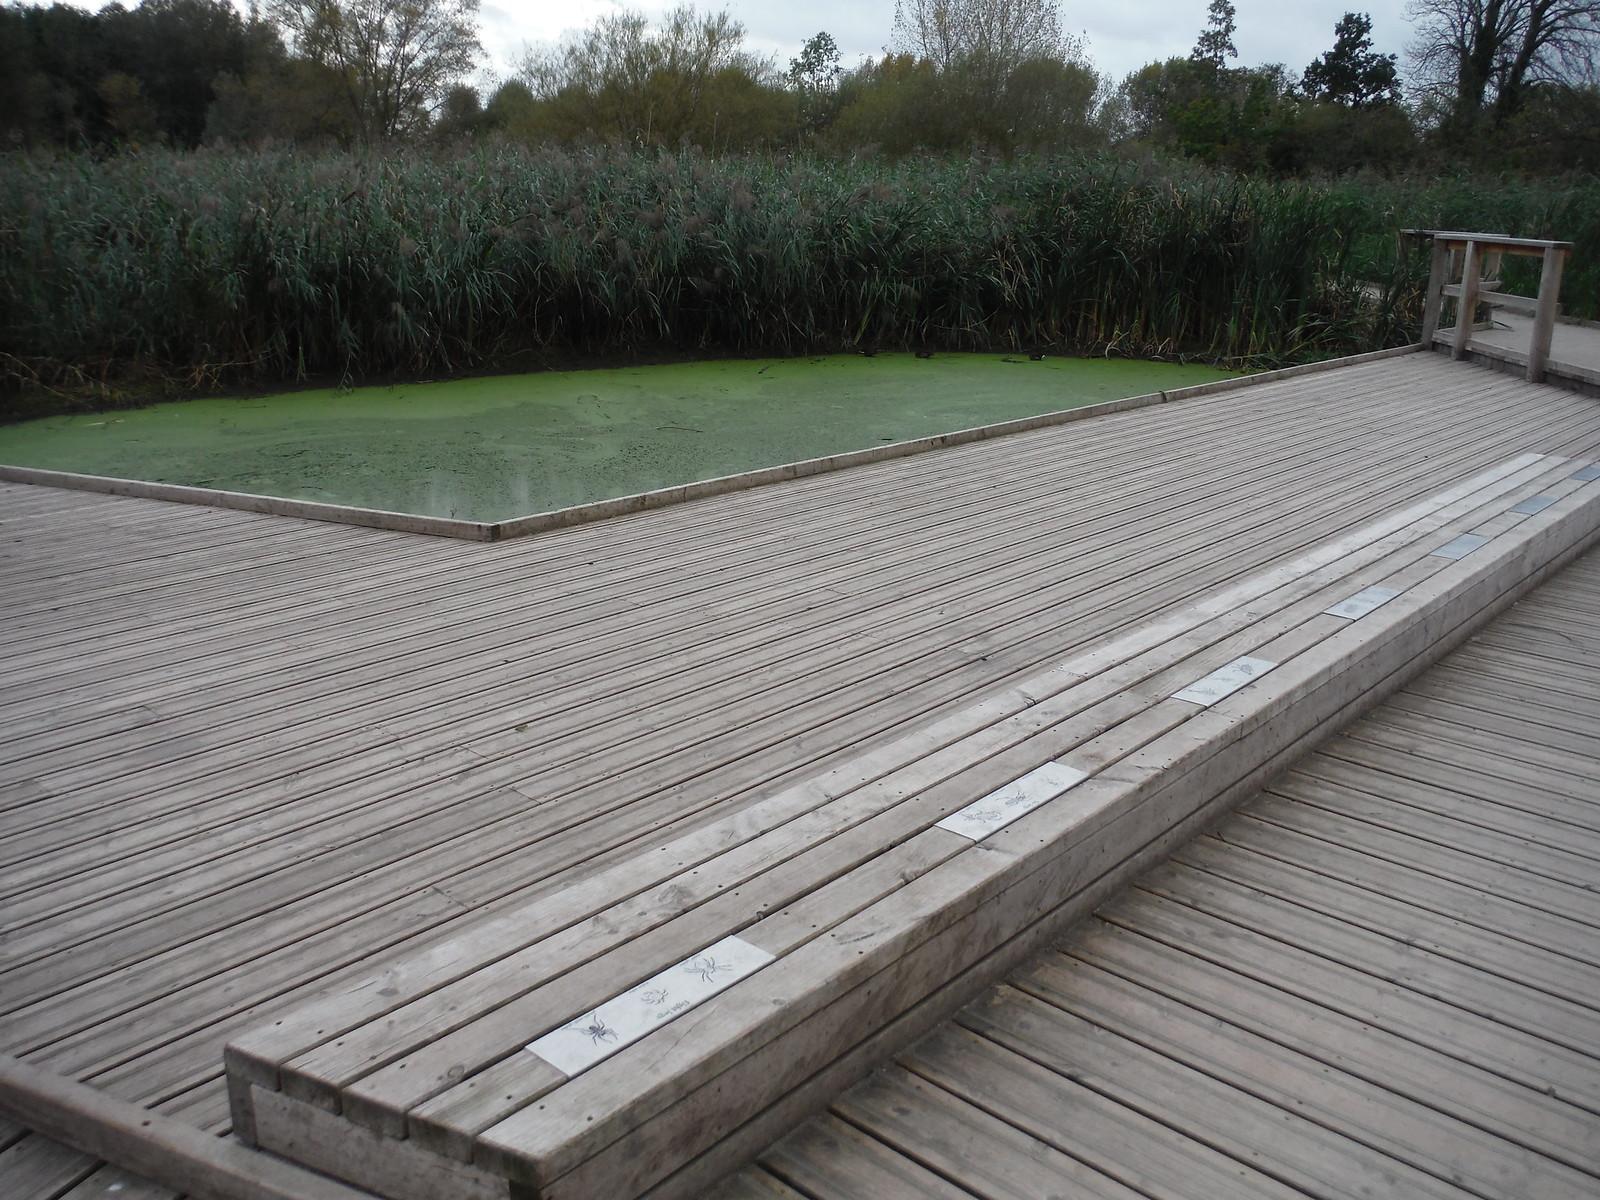 Boardwalk through Wetlands and Rest Area, Morden Hall Park SWC Walk Short 13 - Morden Hall Park and Merton Abbey Mills